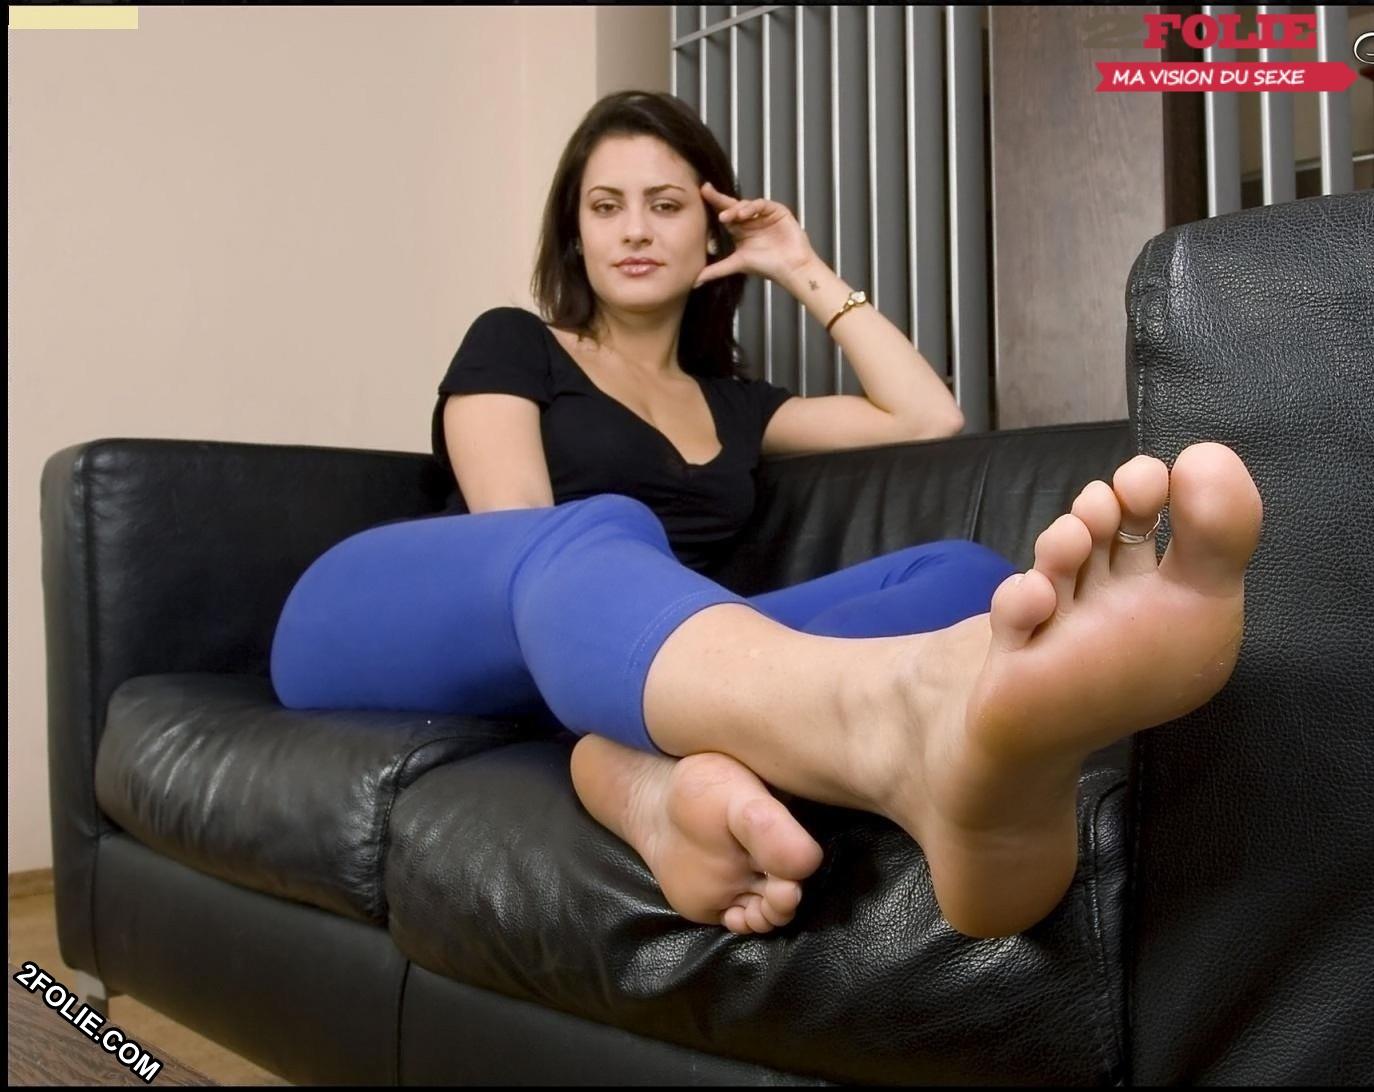 Galerie porno des pieds des femmes